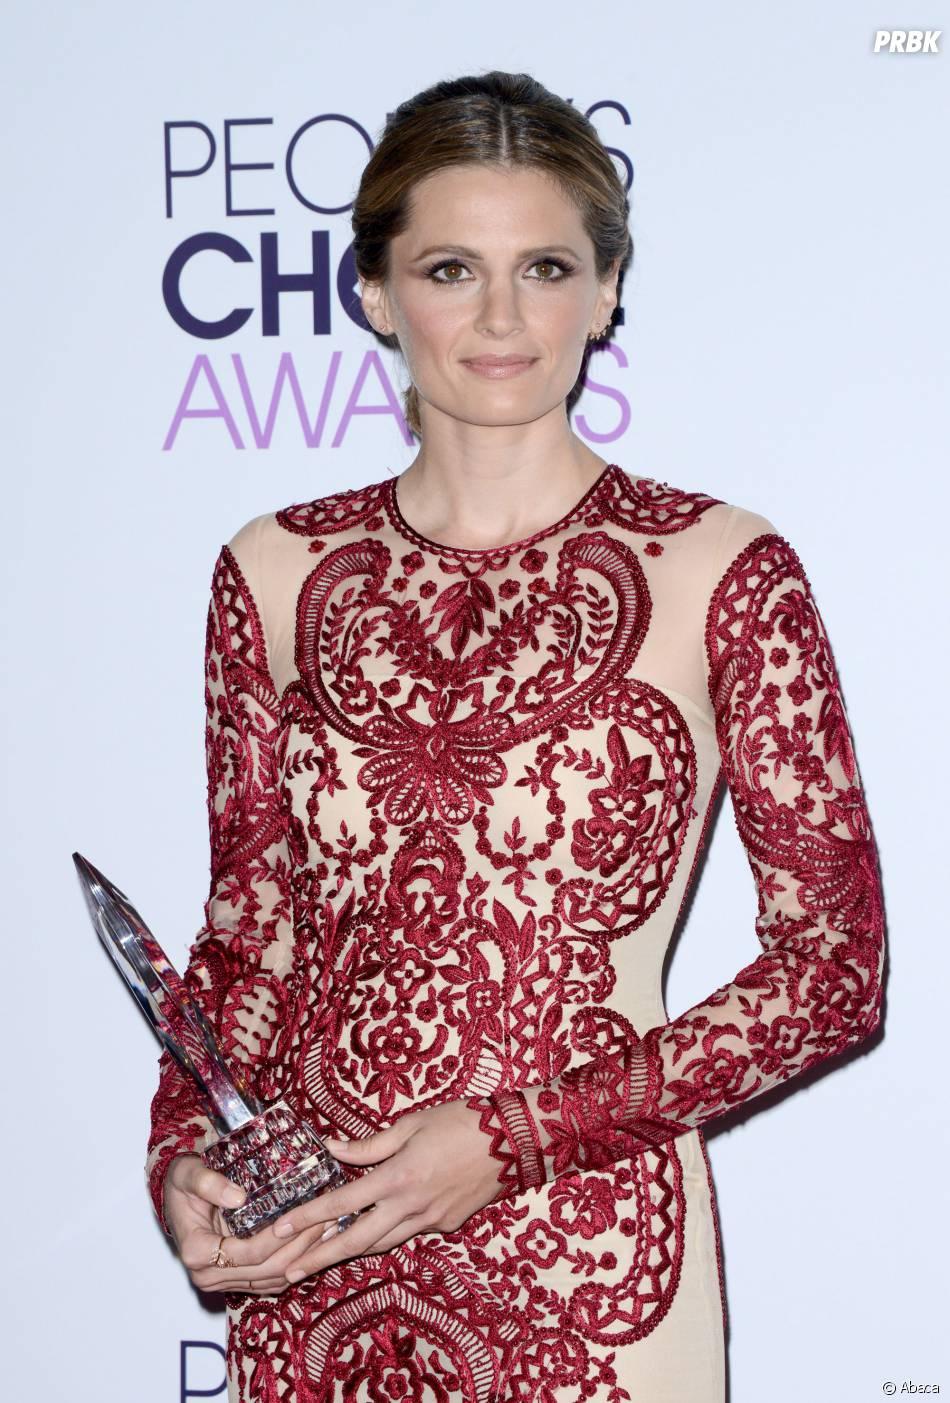 People's Choice Awards 2014 : Stana Katic de Castle remporte un prix